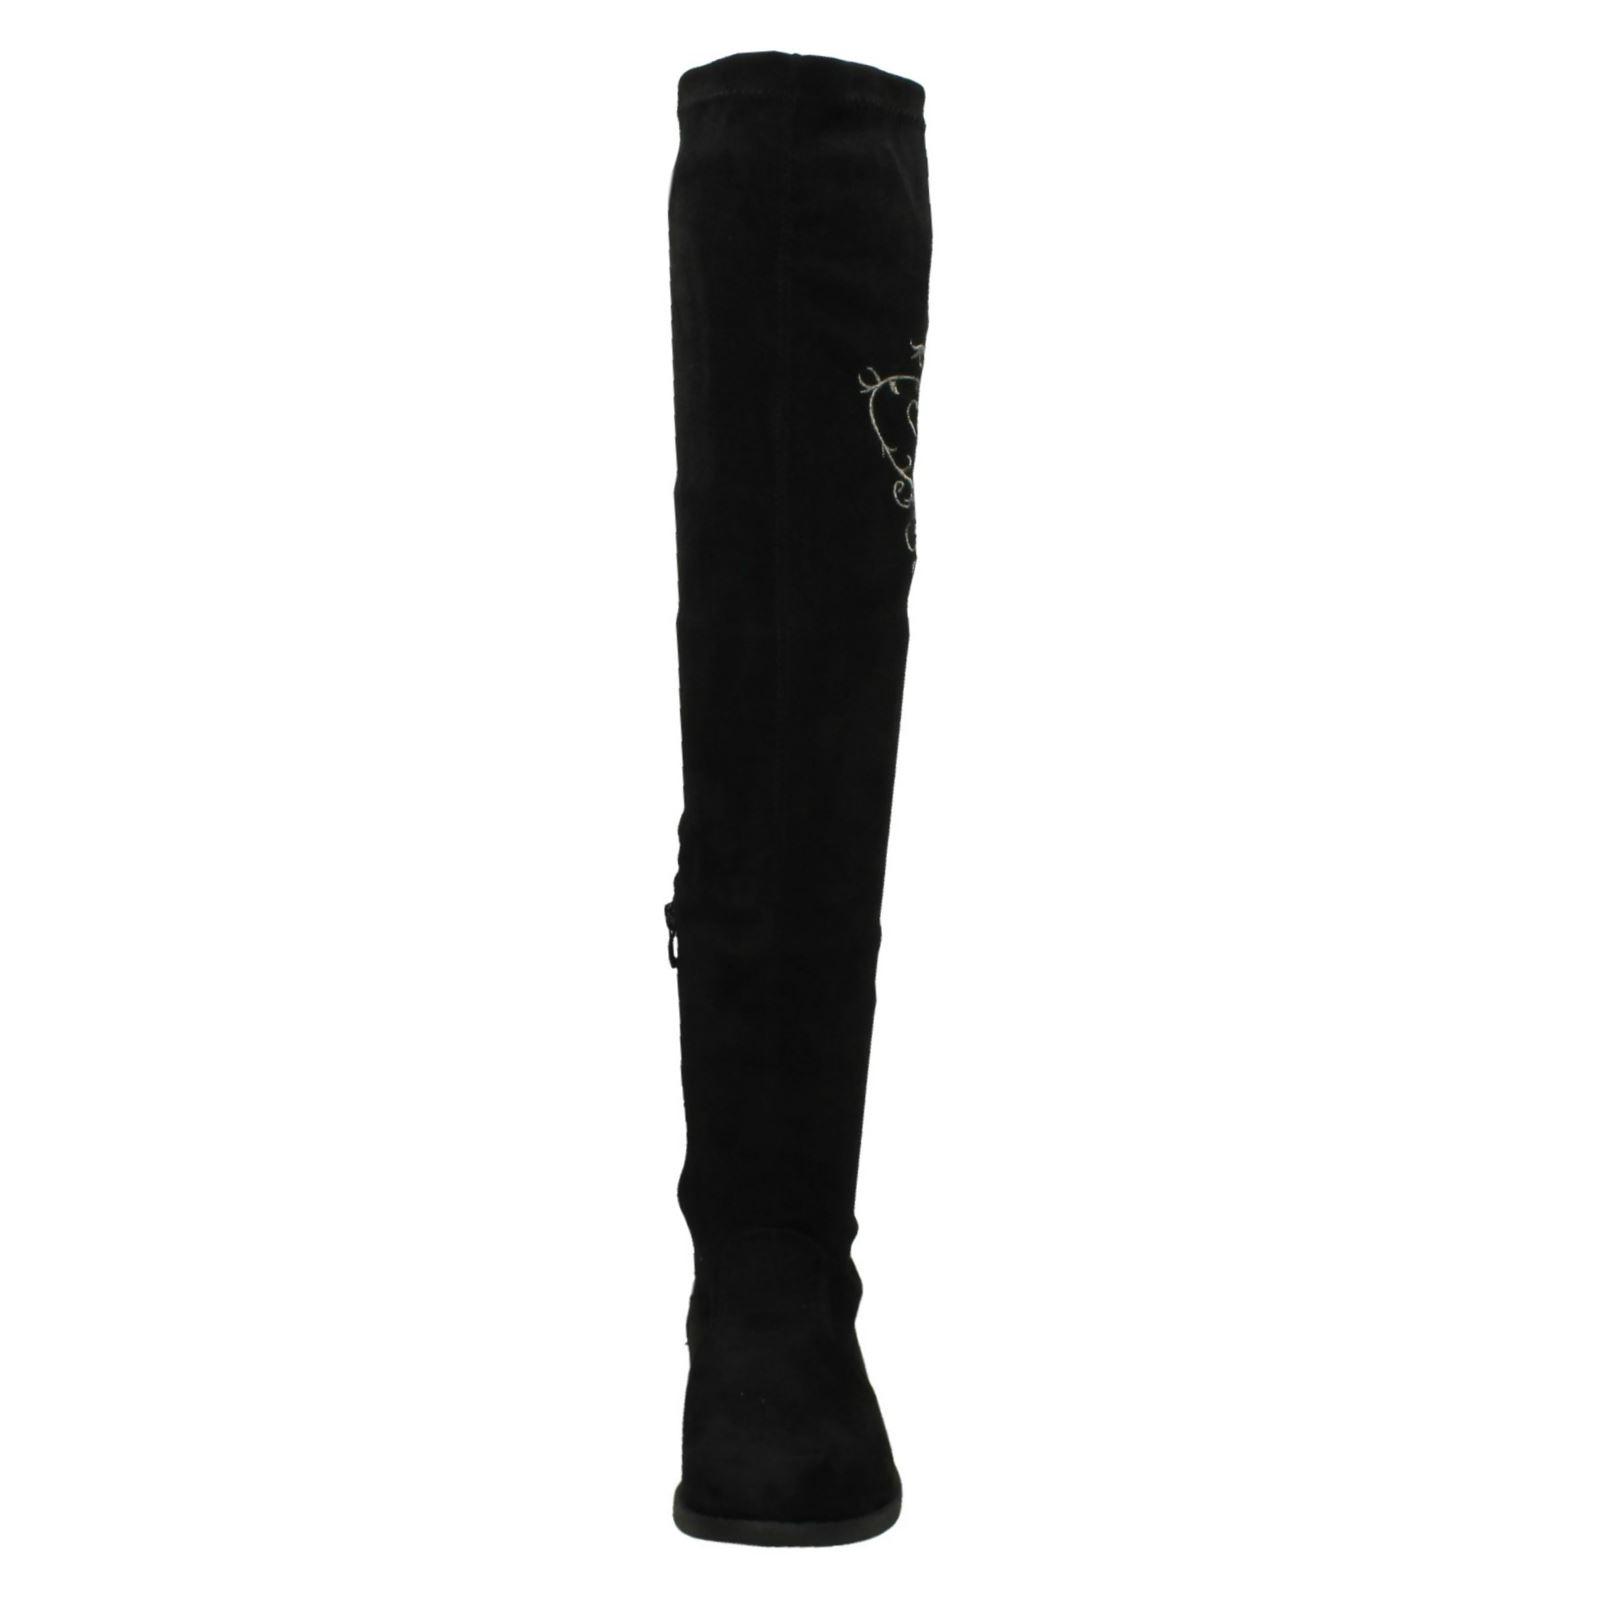 Black Long F50872 Spot On Ladies Label Boots OY7YFnU